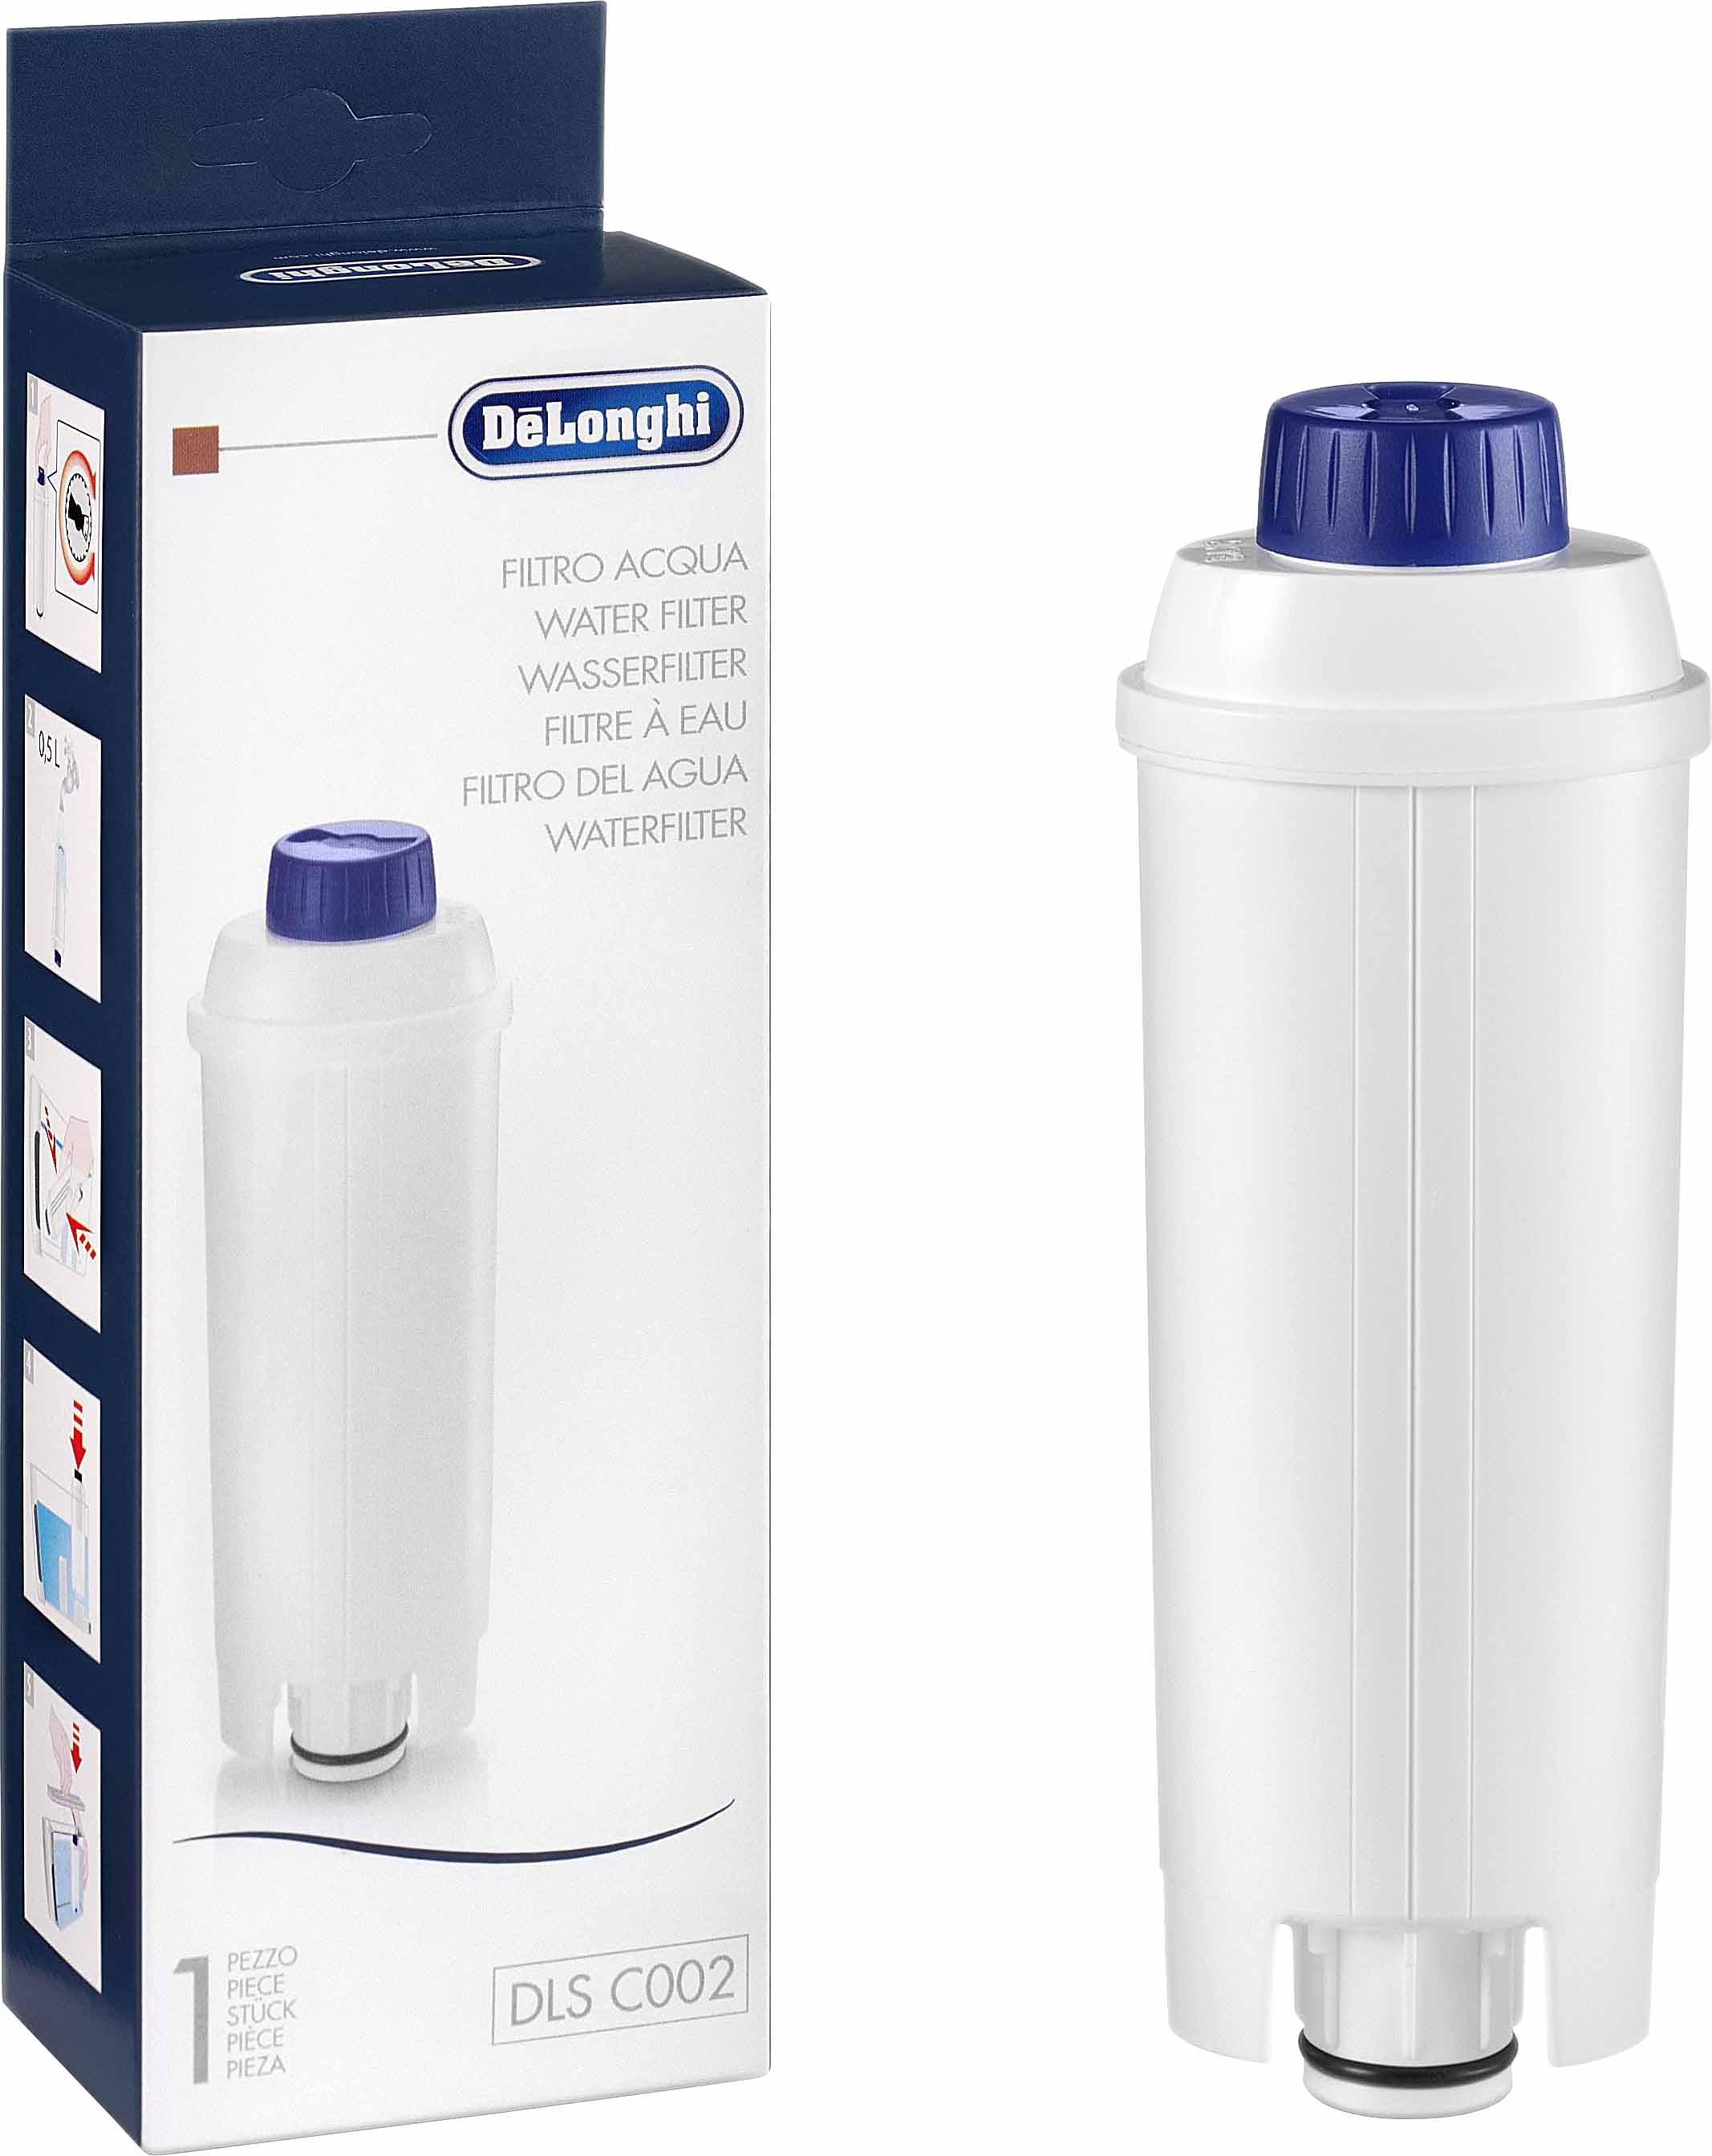 De'longhi Waterfilter DLSC002 - gratis ruilen op otto.nl